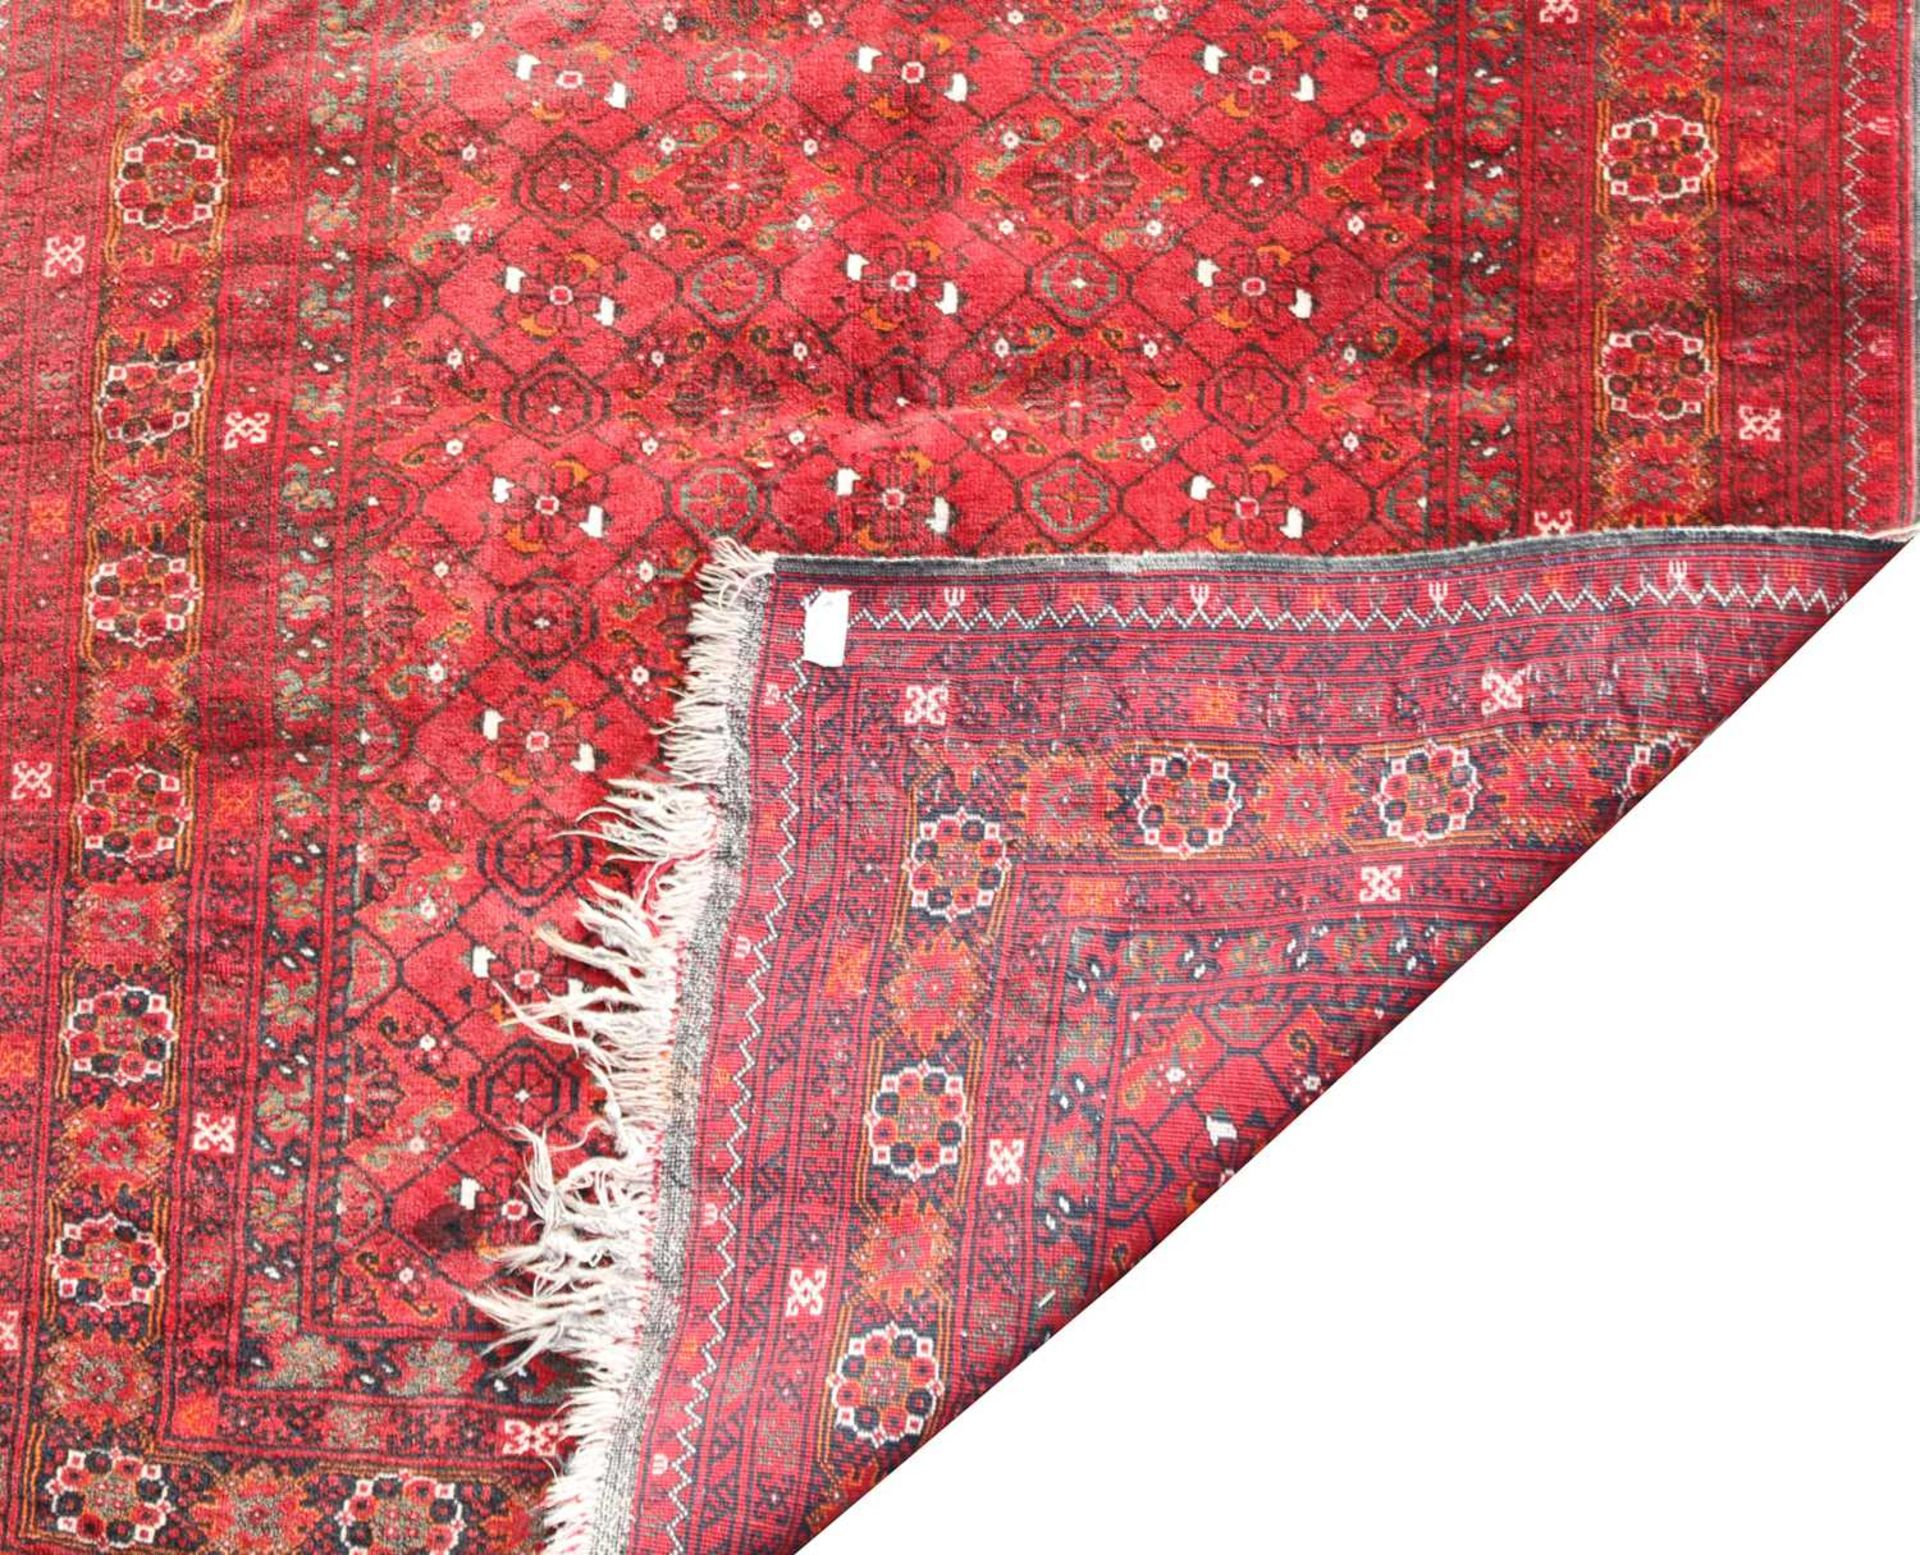 An Afghan Beshir rug, - Image 3 of 4